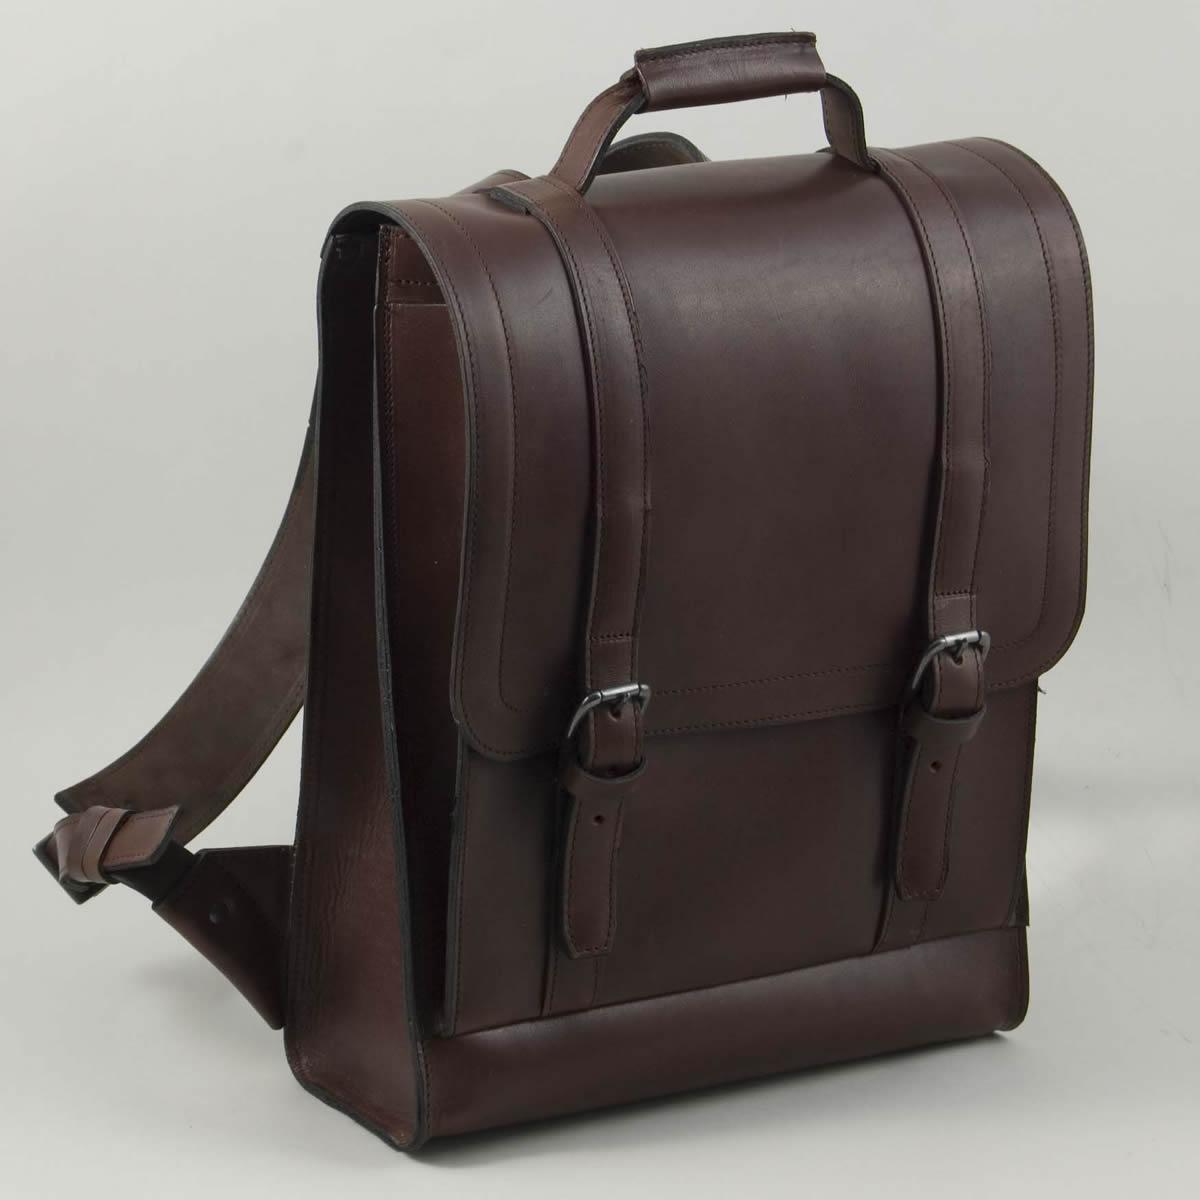 Large Bookbag